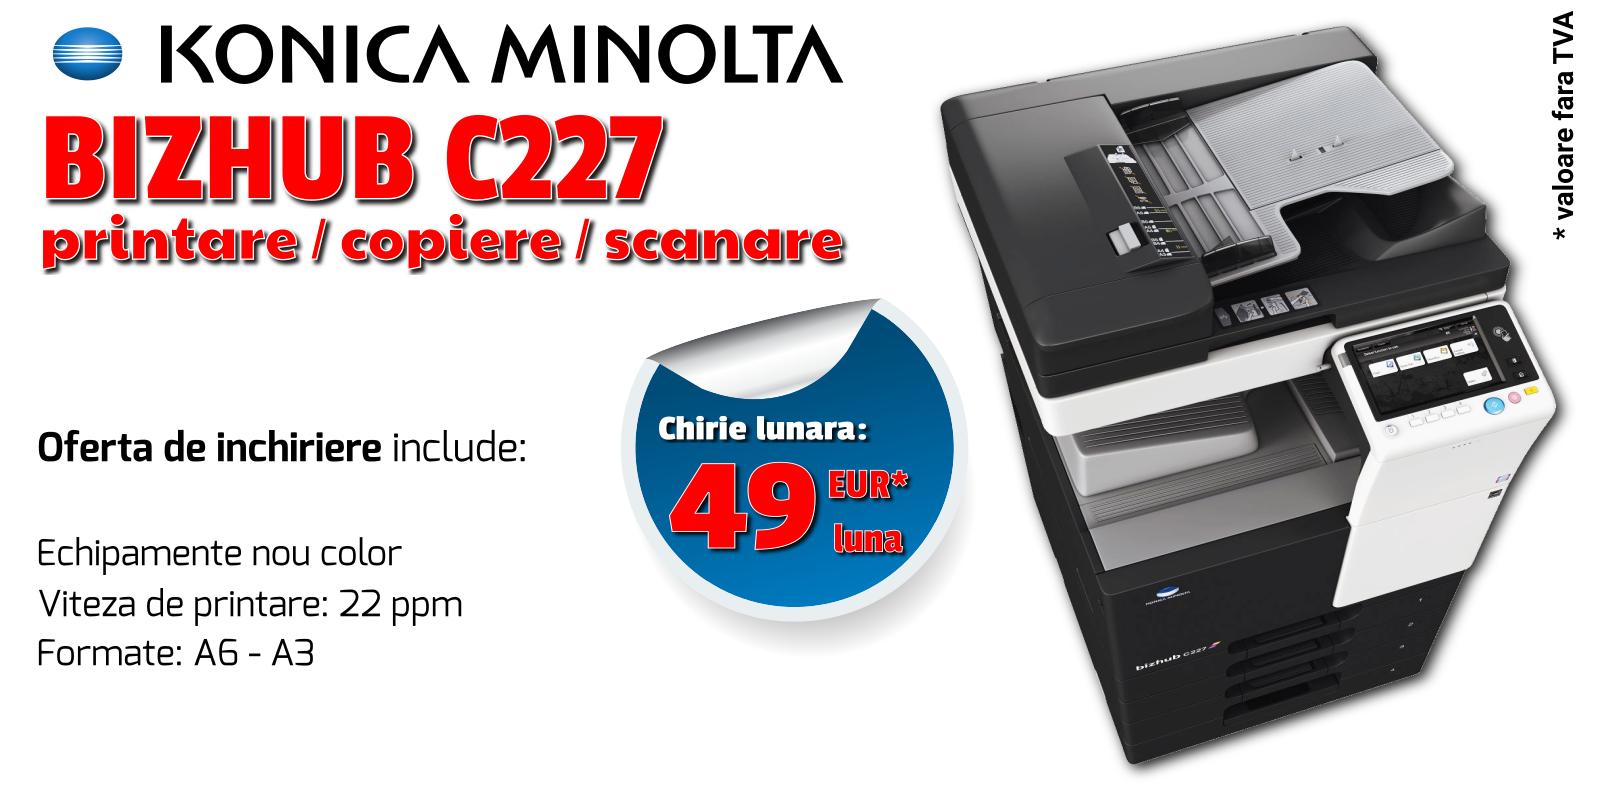 Promotii inchiriere echipamente de printare, imprimante laser si multifunctionale prin Romsystem.ro - Konica Minolta Bizhub C227